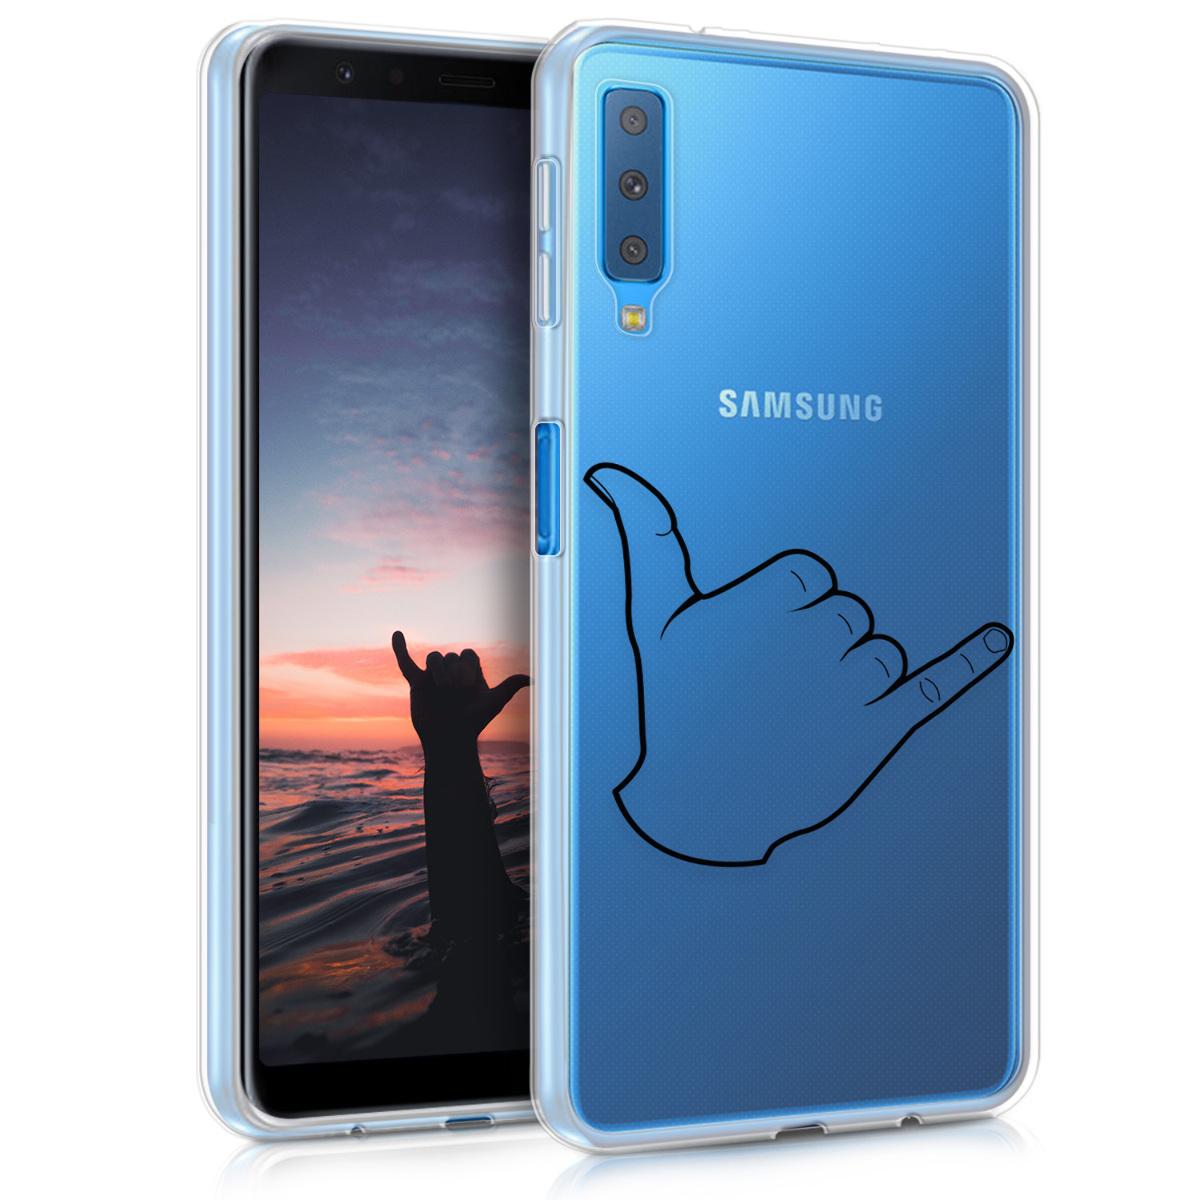 KW Θήκη Σιλικόνης Samsung Galaxy A7 2018 - Transparent / Black (46430.06)